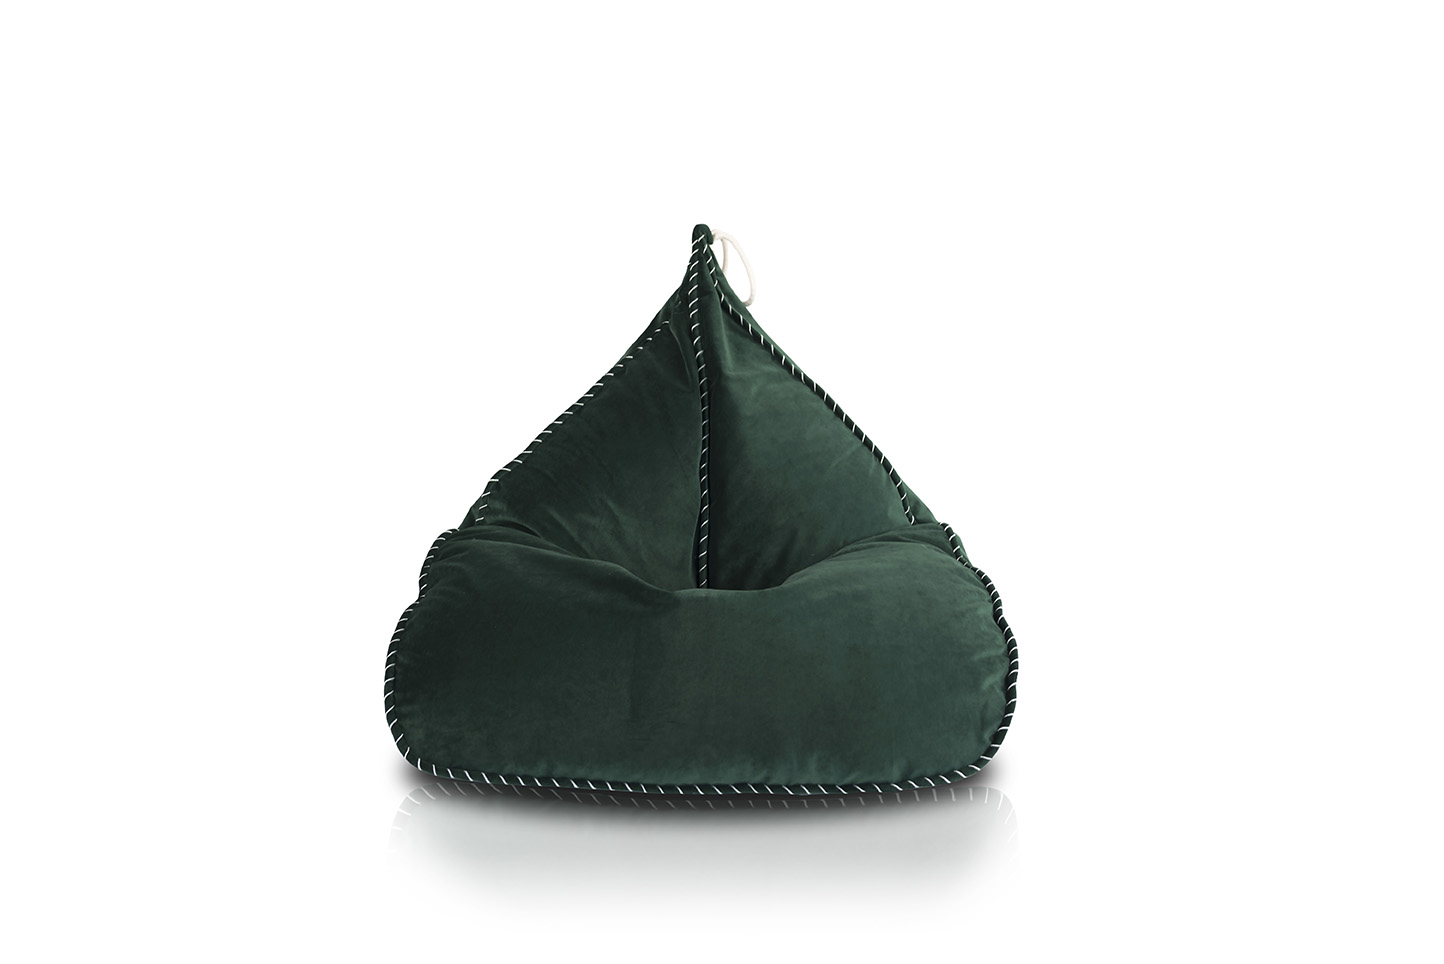 Pufa-modo-nobonobo-bellagio-82 (1)